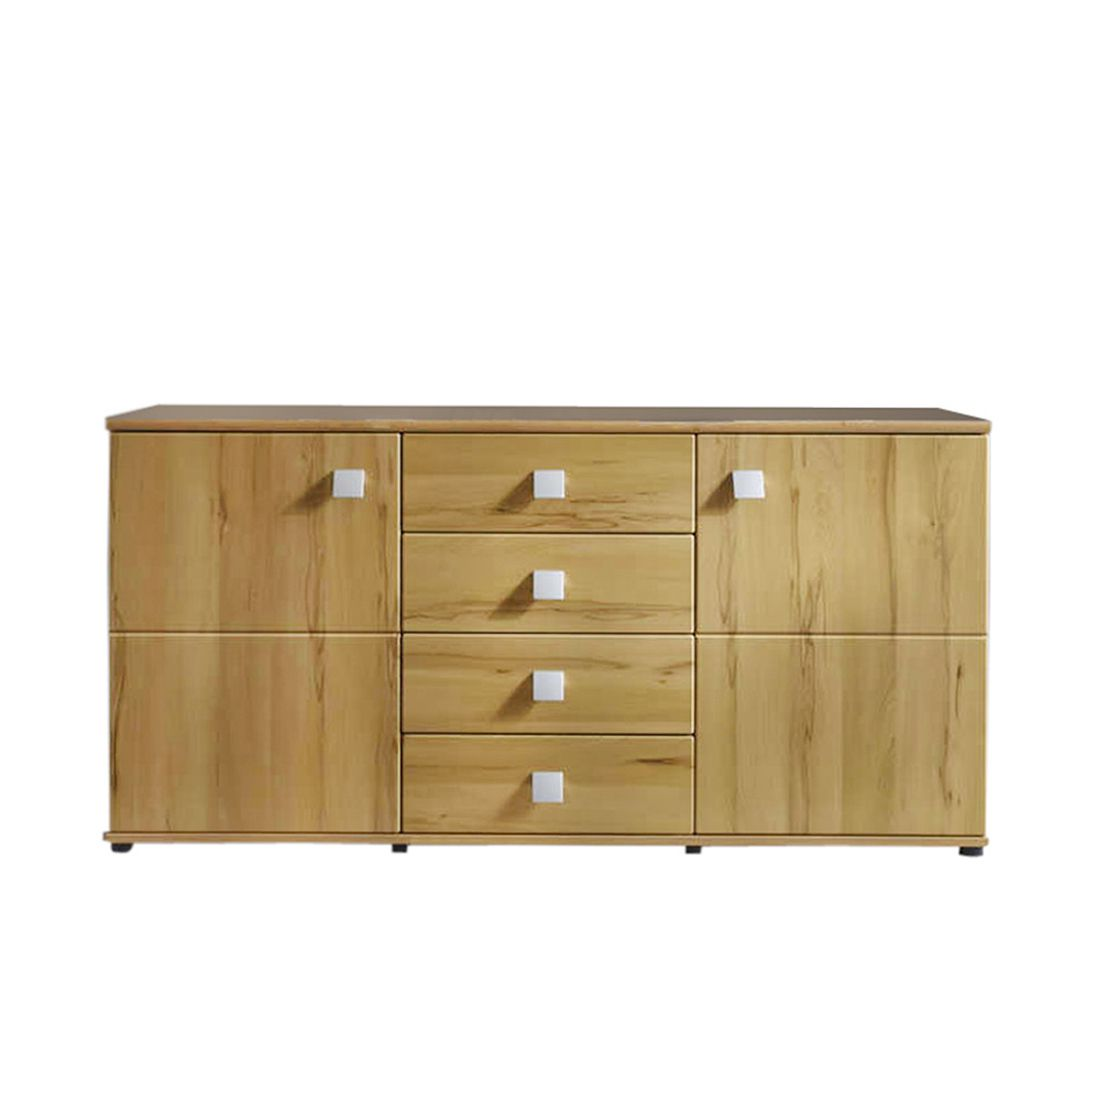 sideboard santa buchendekor 4 schubf cher 2 t ren. Black Bedroom Furniture Sets. Home Design Ideas